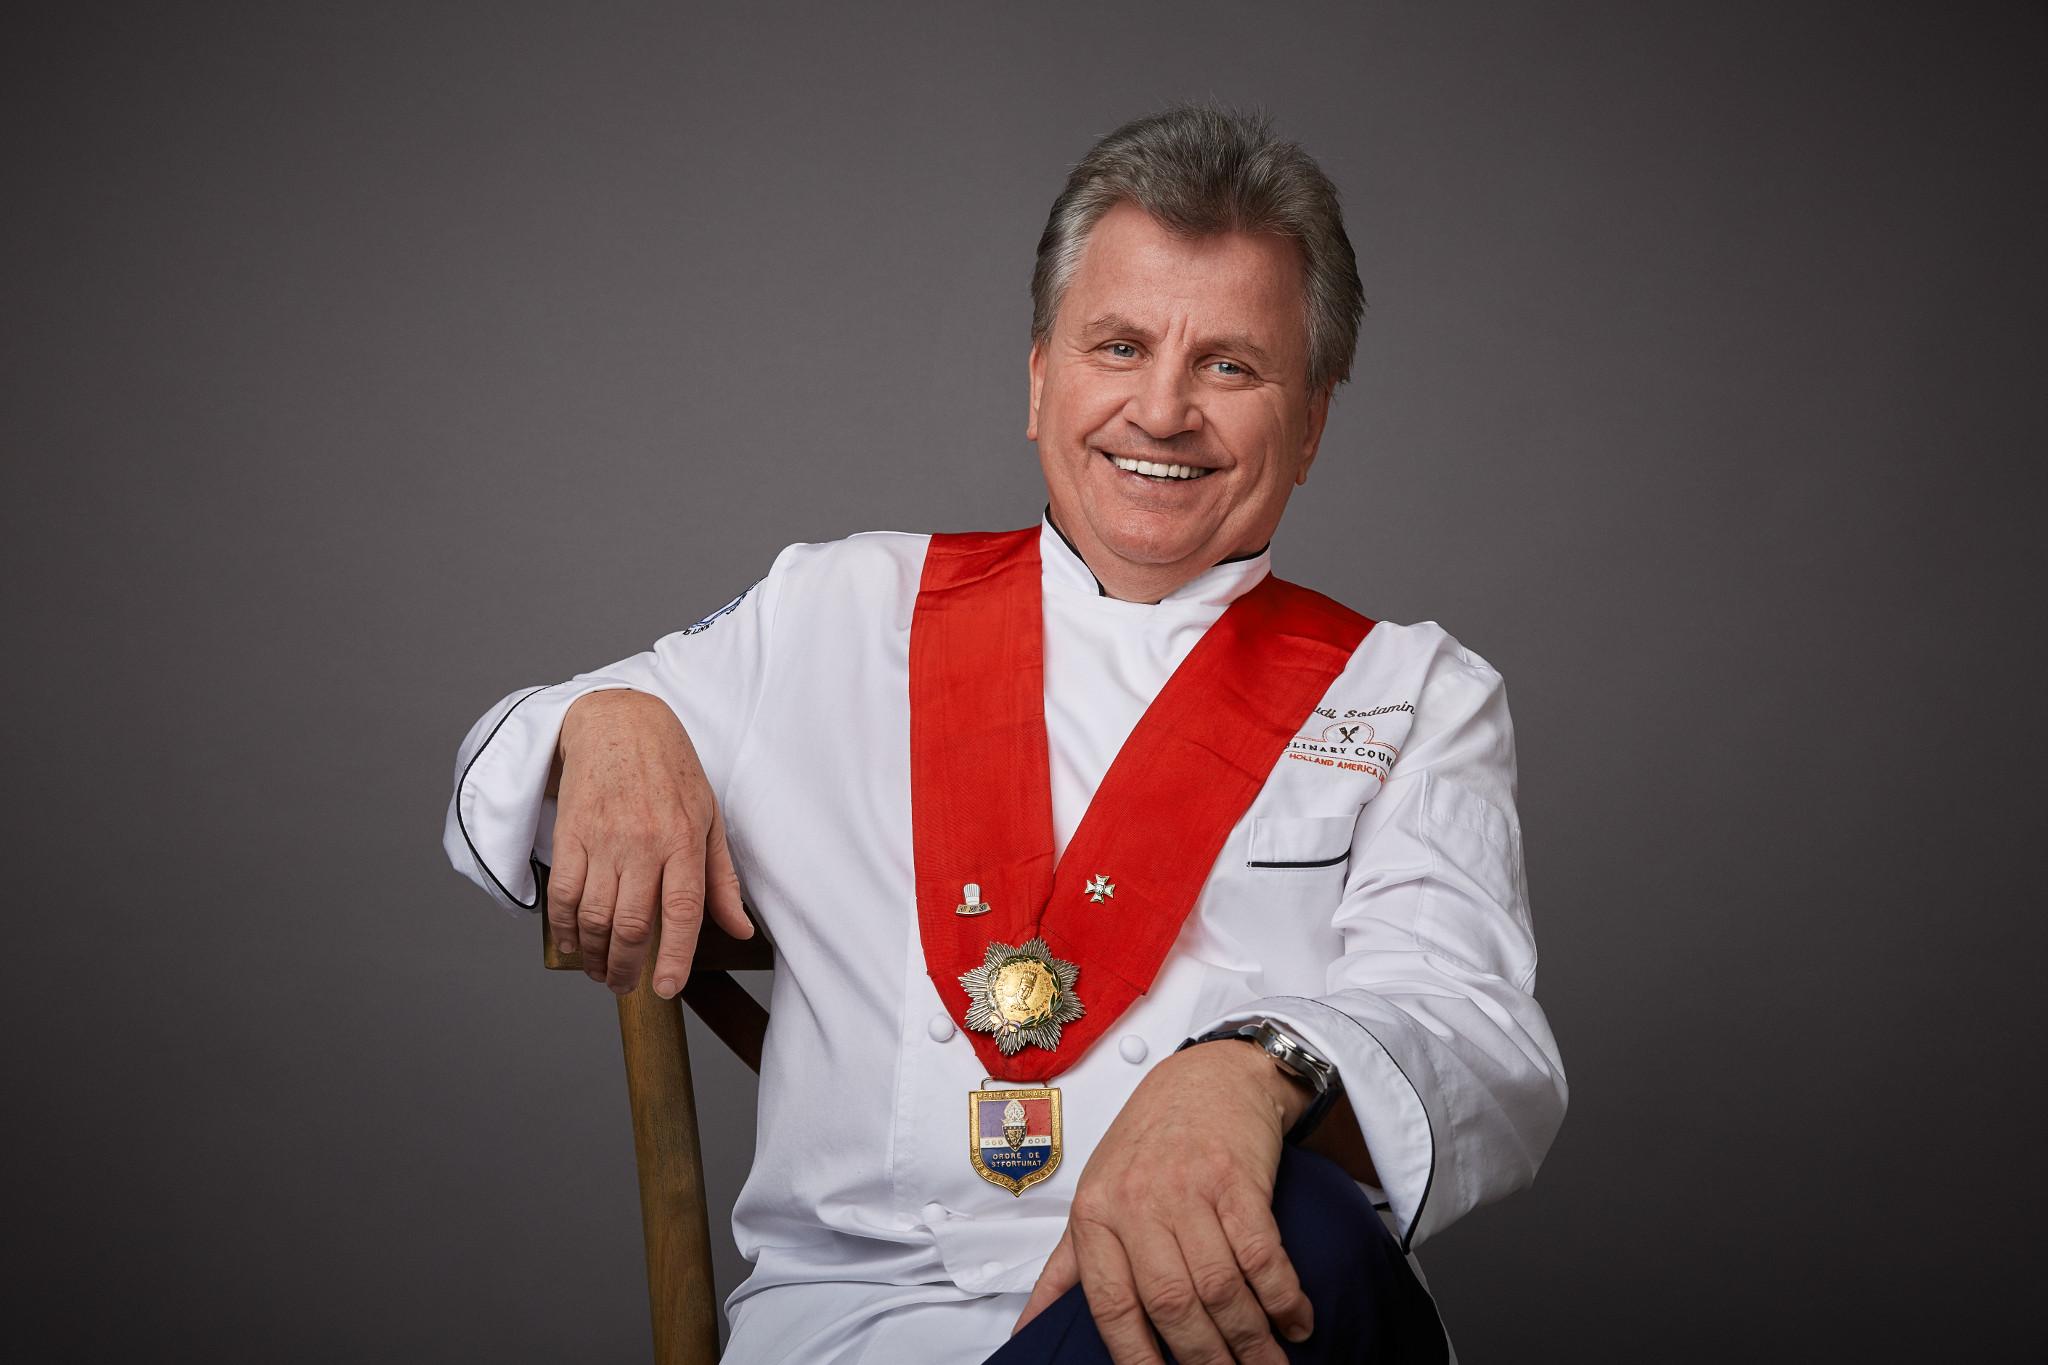 Master Chef Rudi Sodamin, Chairman of Holland America Line's Culinary Council